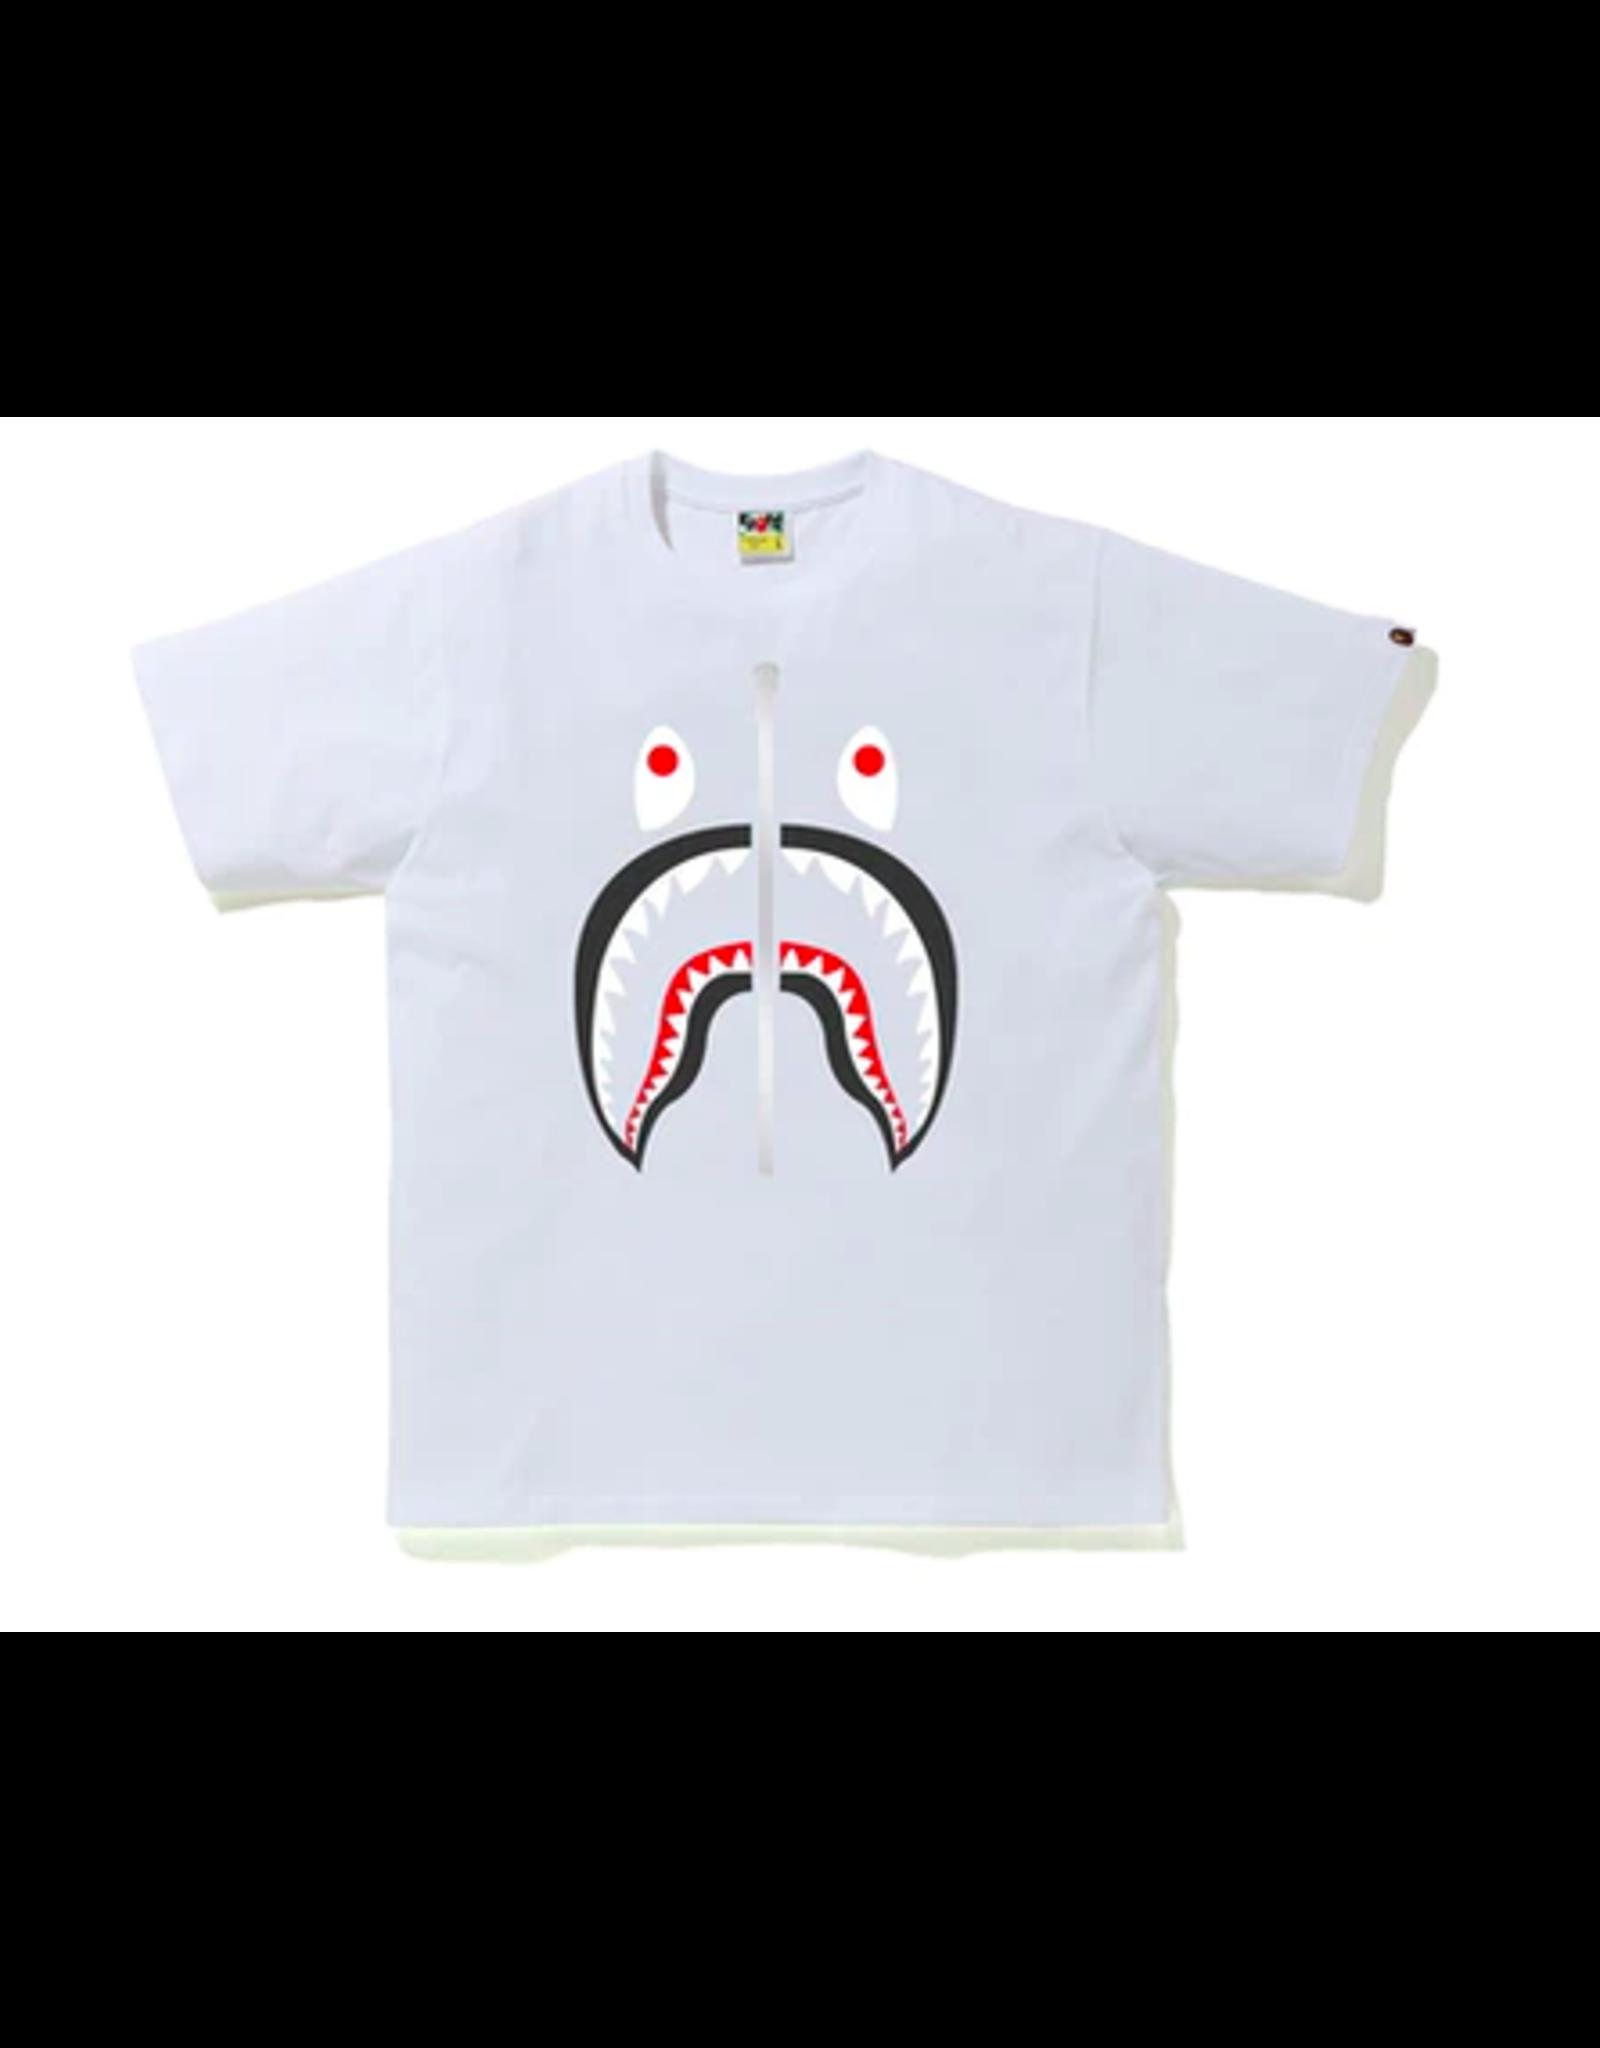 BAPE Bape Shark Tee White XL